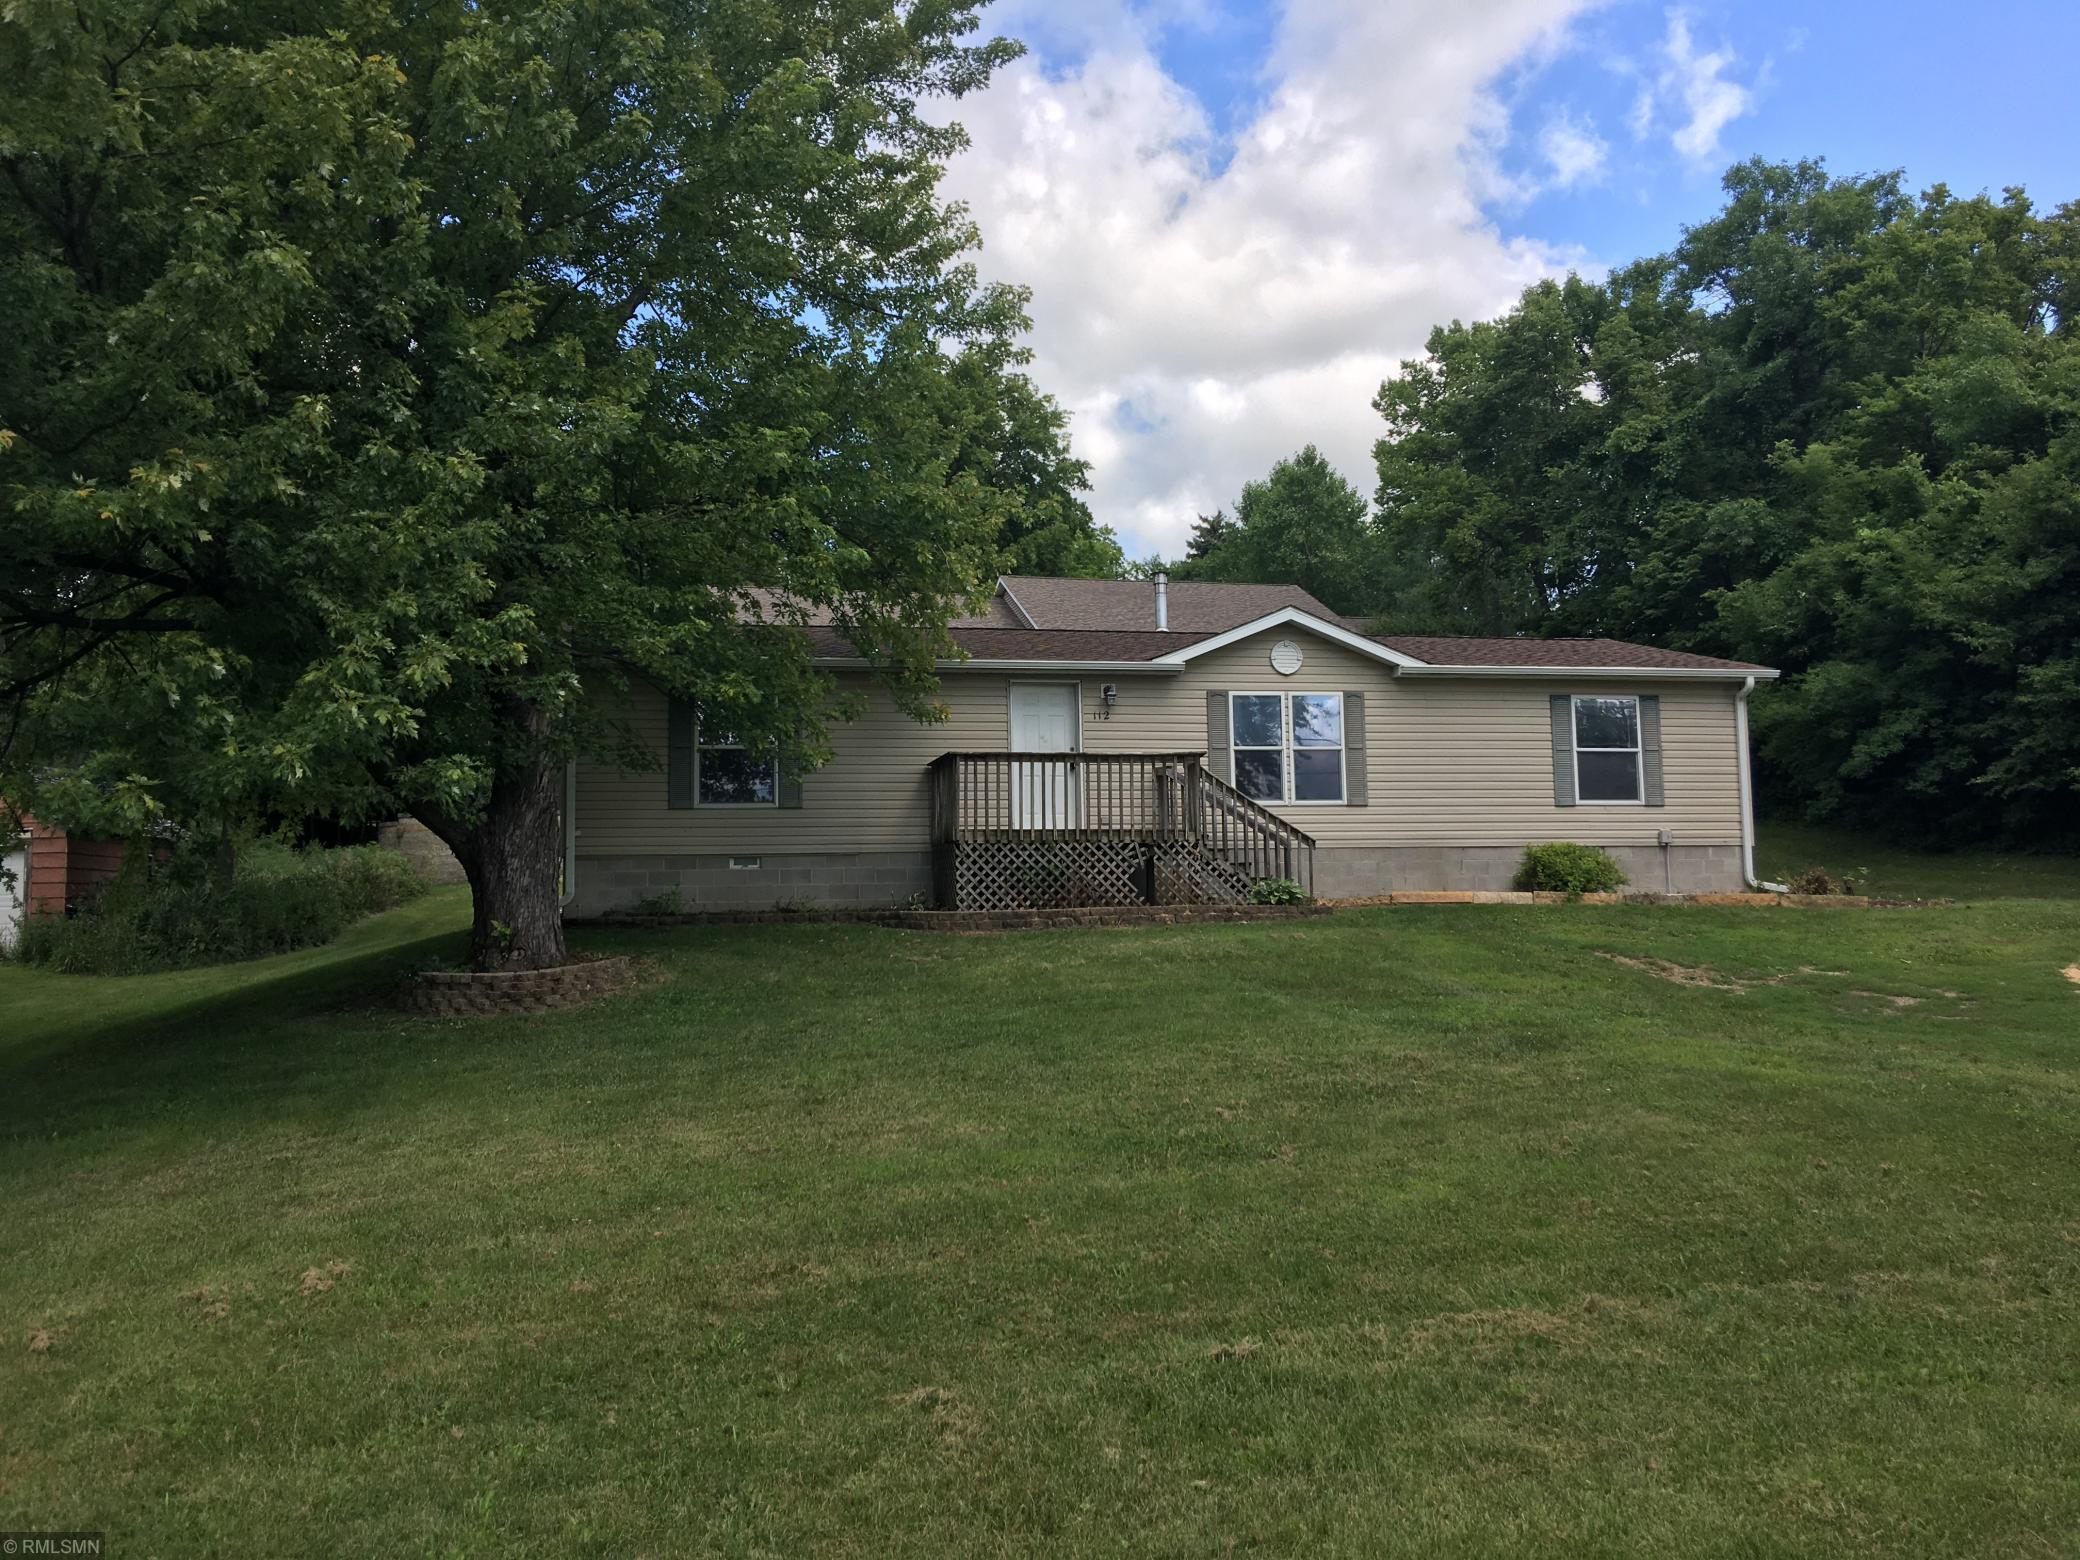 112 Park Avenue NE Property Photo - Elysian, MN real estate listing